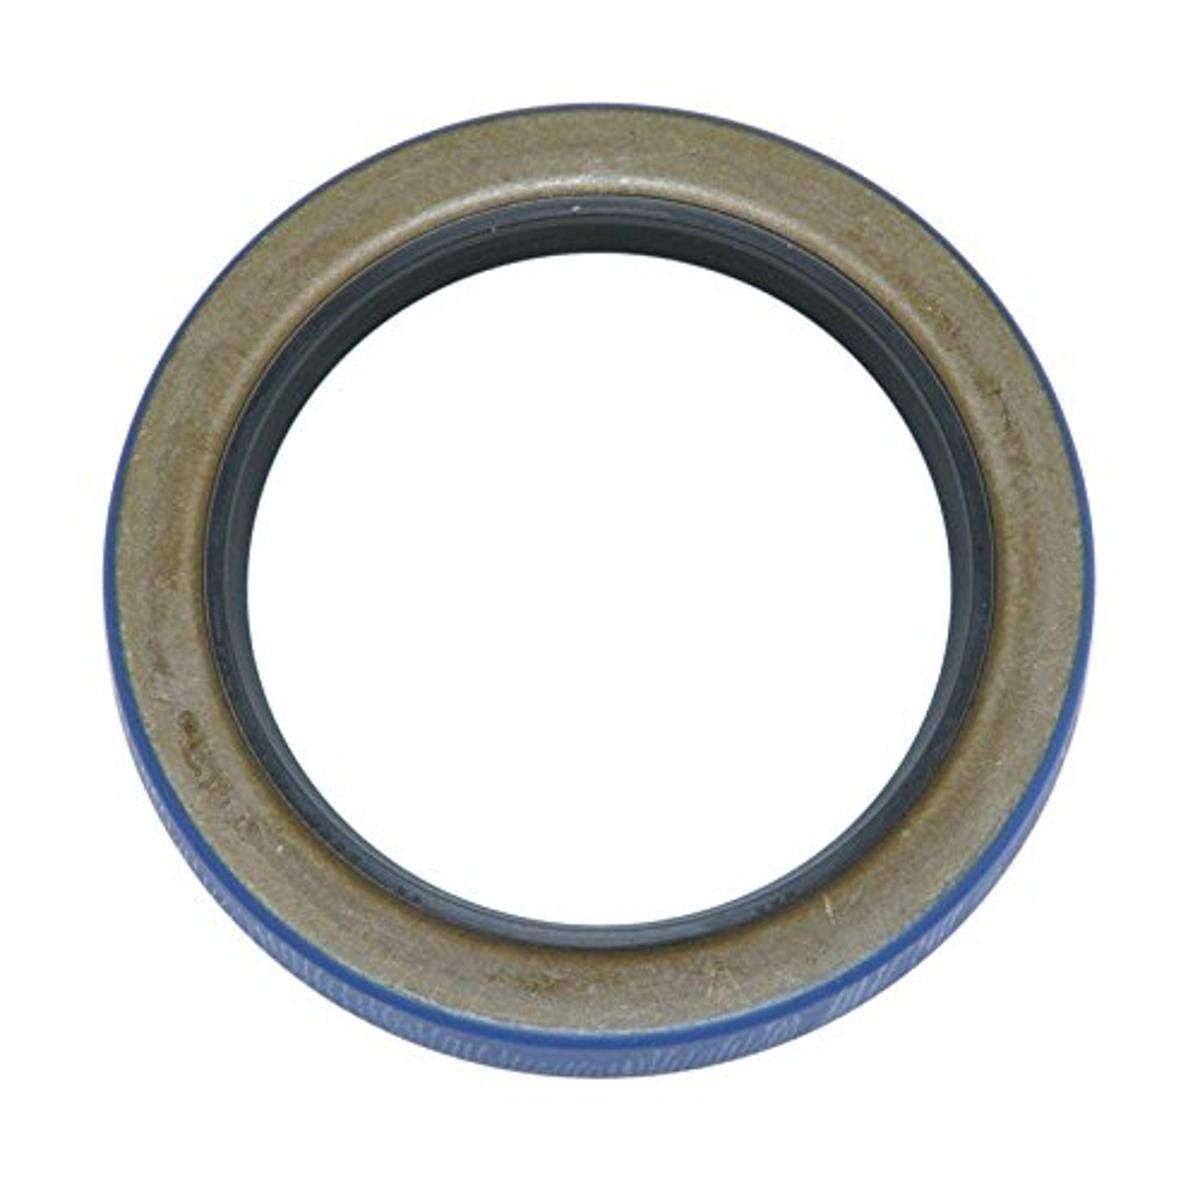 TCM 1101306SA-H-BX NBR Buna Rubber Carbon Oil SA-H S Max 56% OFF Steel Type Award